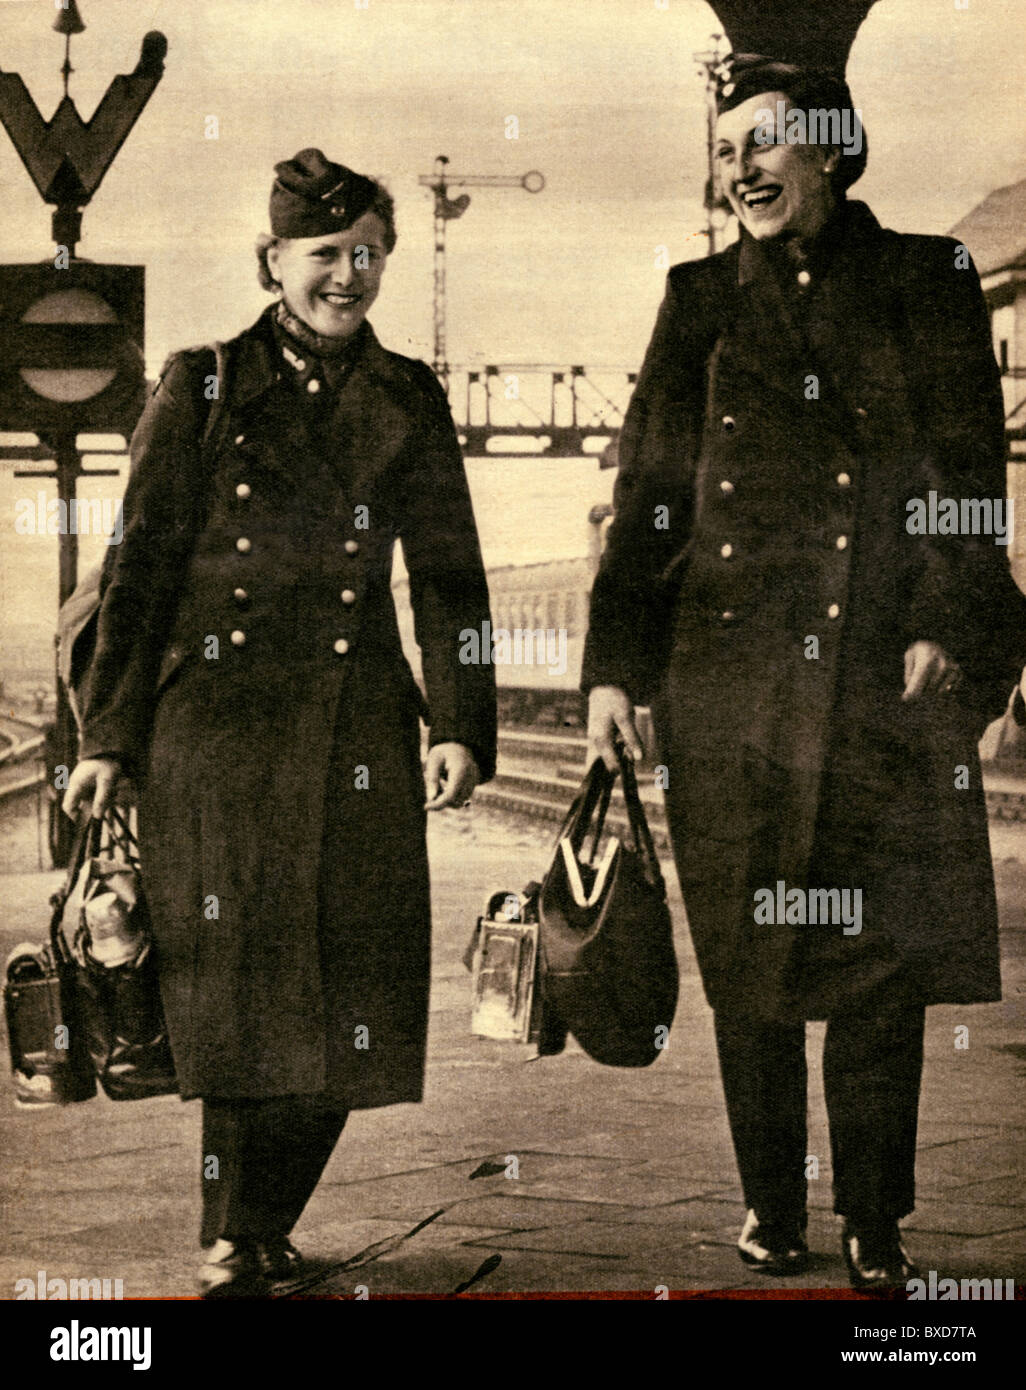 "people, women, 1940s, Germany, female train conductors returning from work, from ""Das Illustrierte Blatt"", 31.5.1941, Stock Photo"